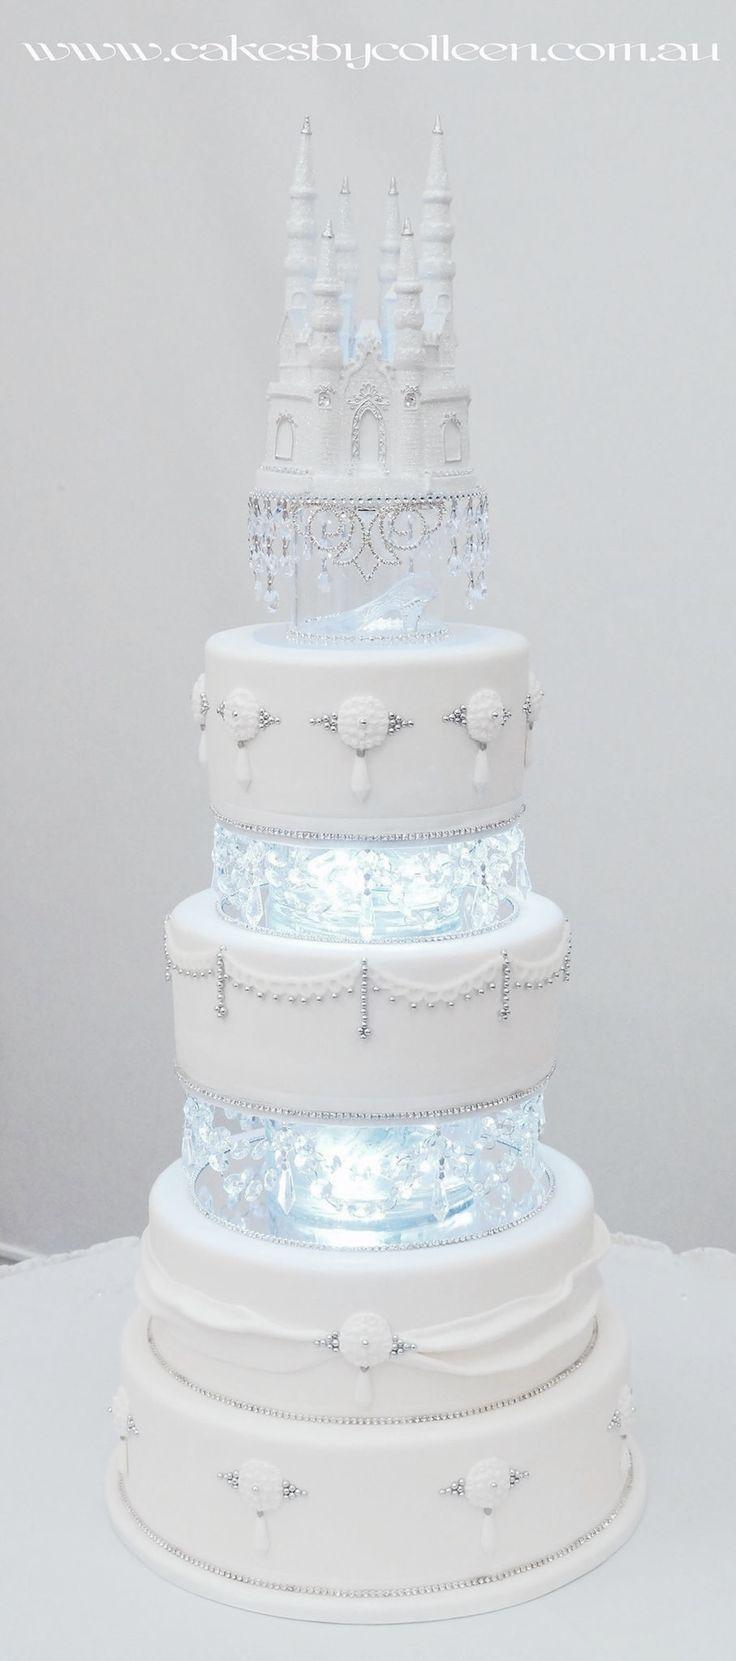 10 best camelai images on Pinterest | Cake wedding, Weddings and ...